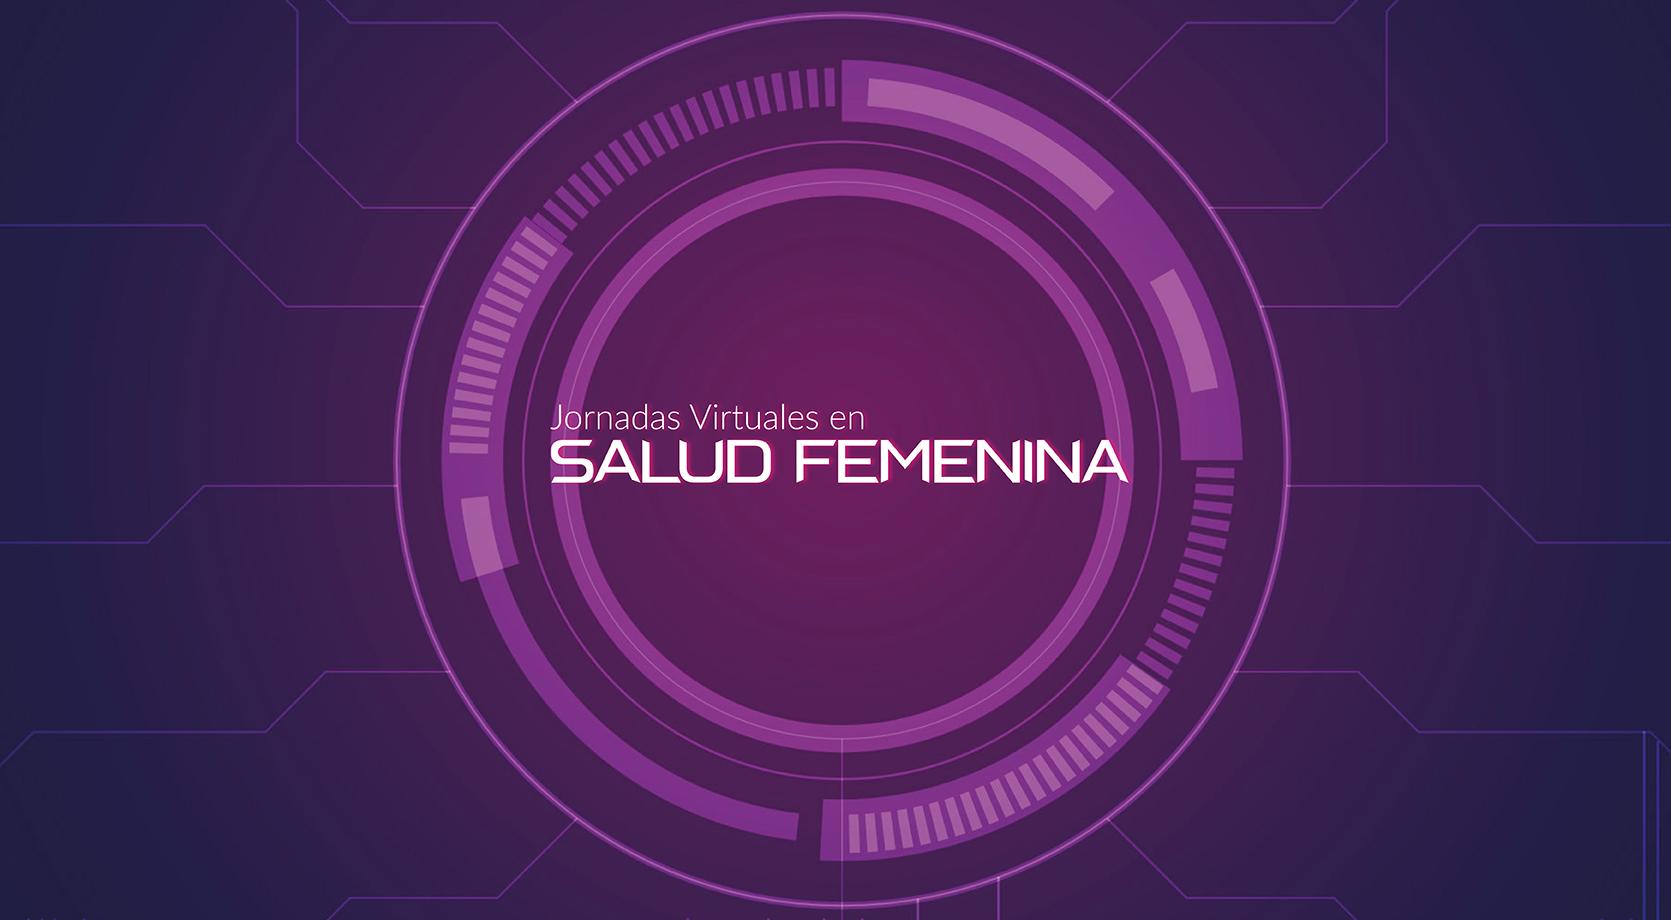 Jornadas Virtuales en Salud Femenina 2020